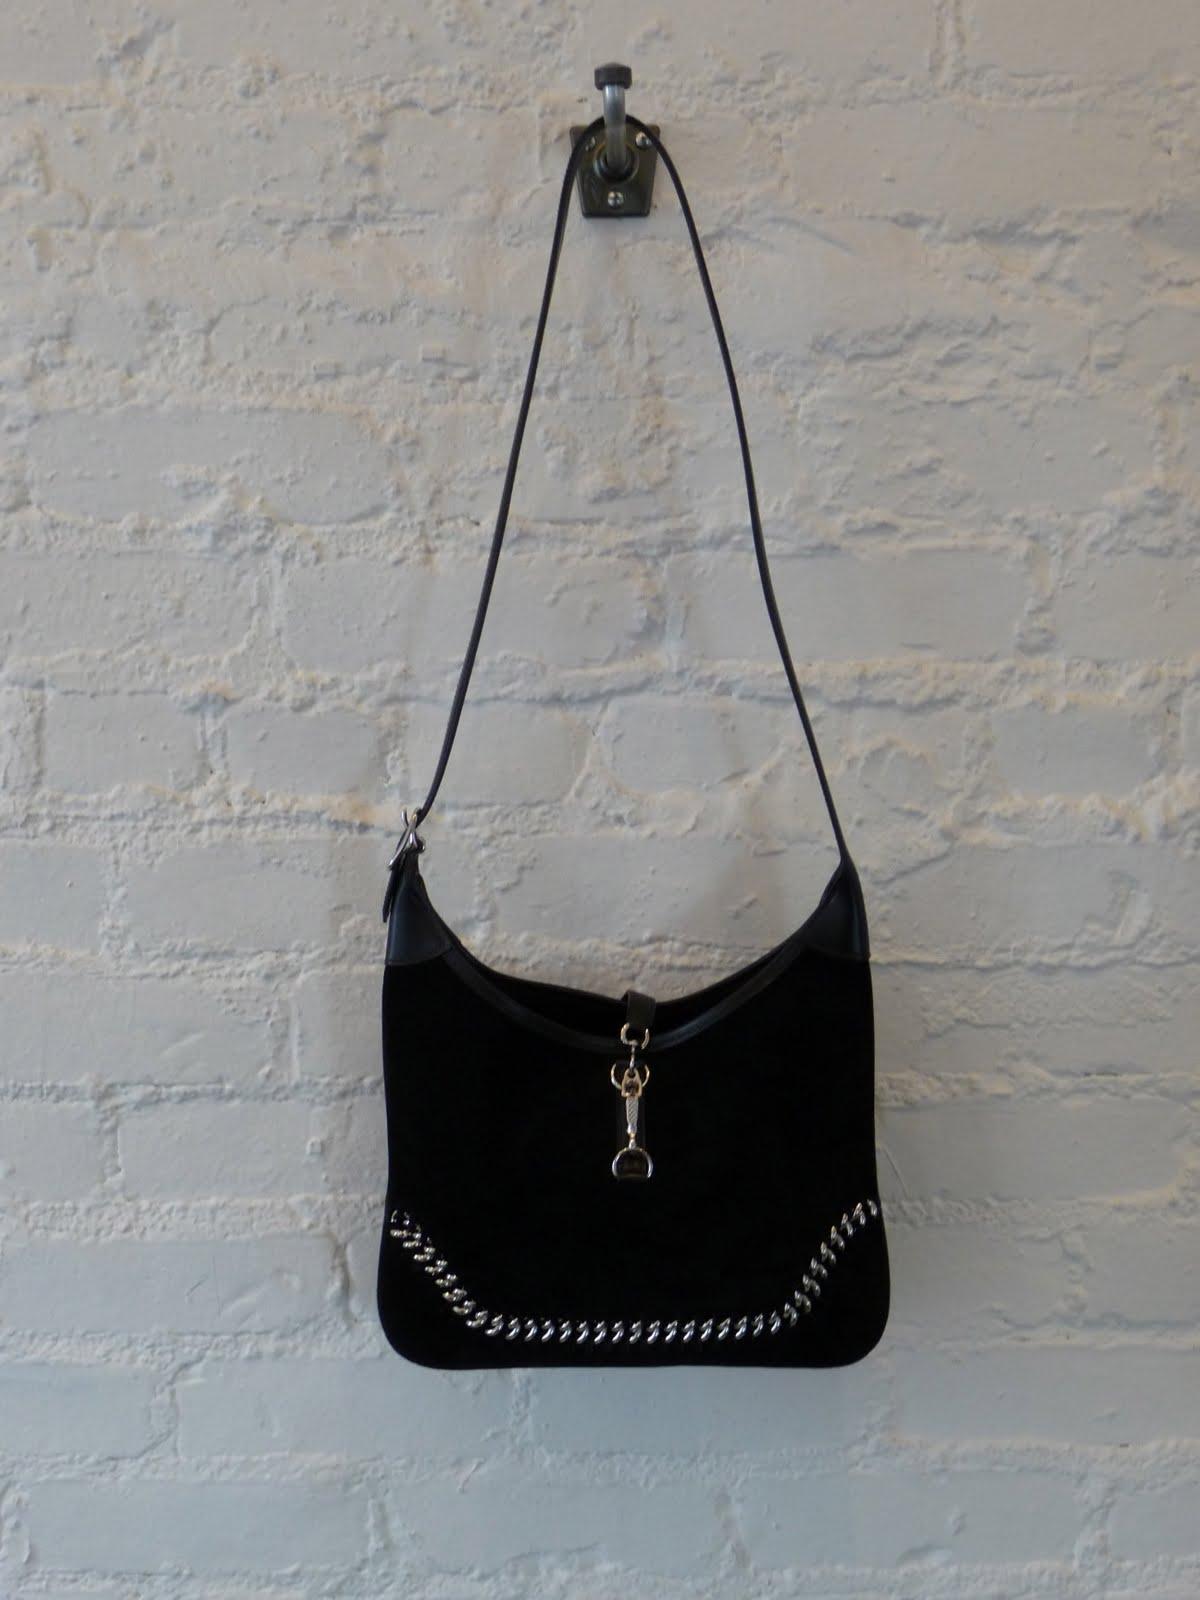 birkin bag for sale - hermes bolide small black